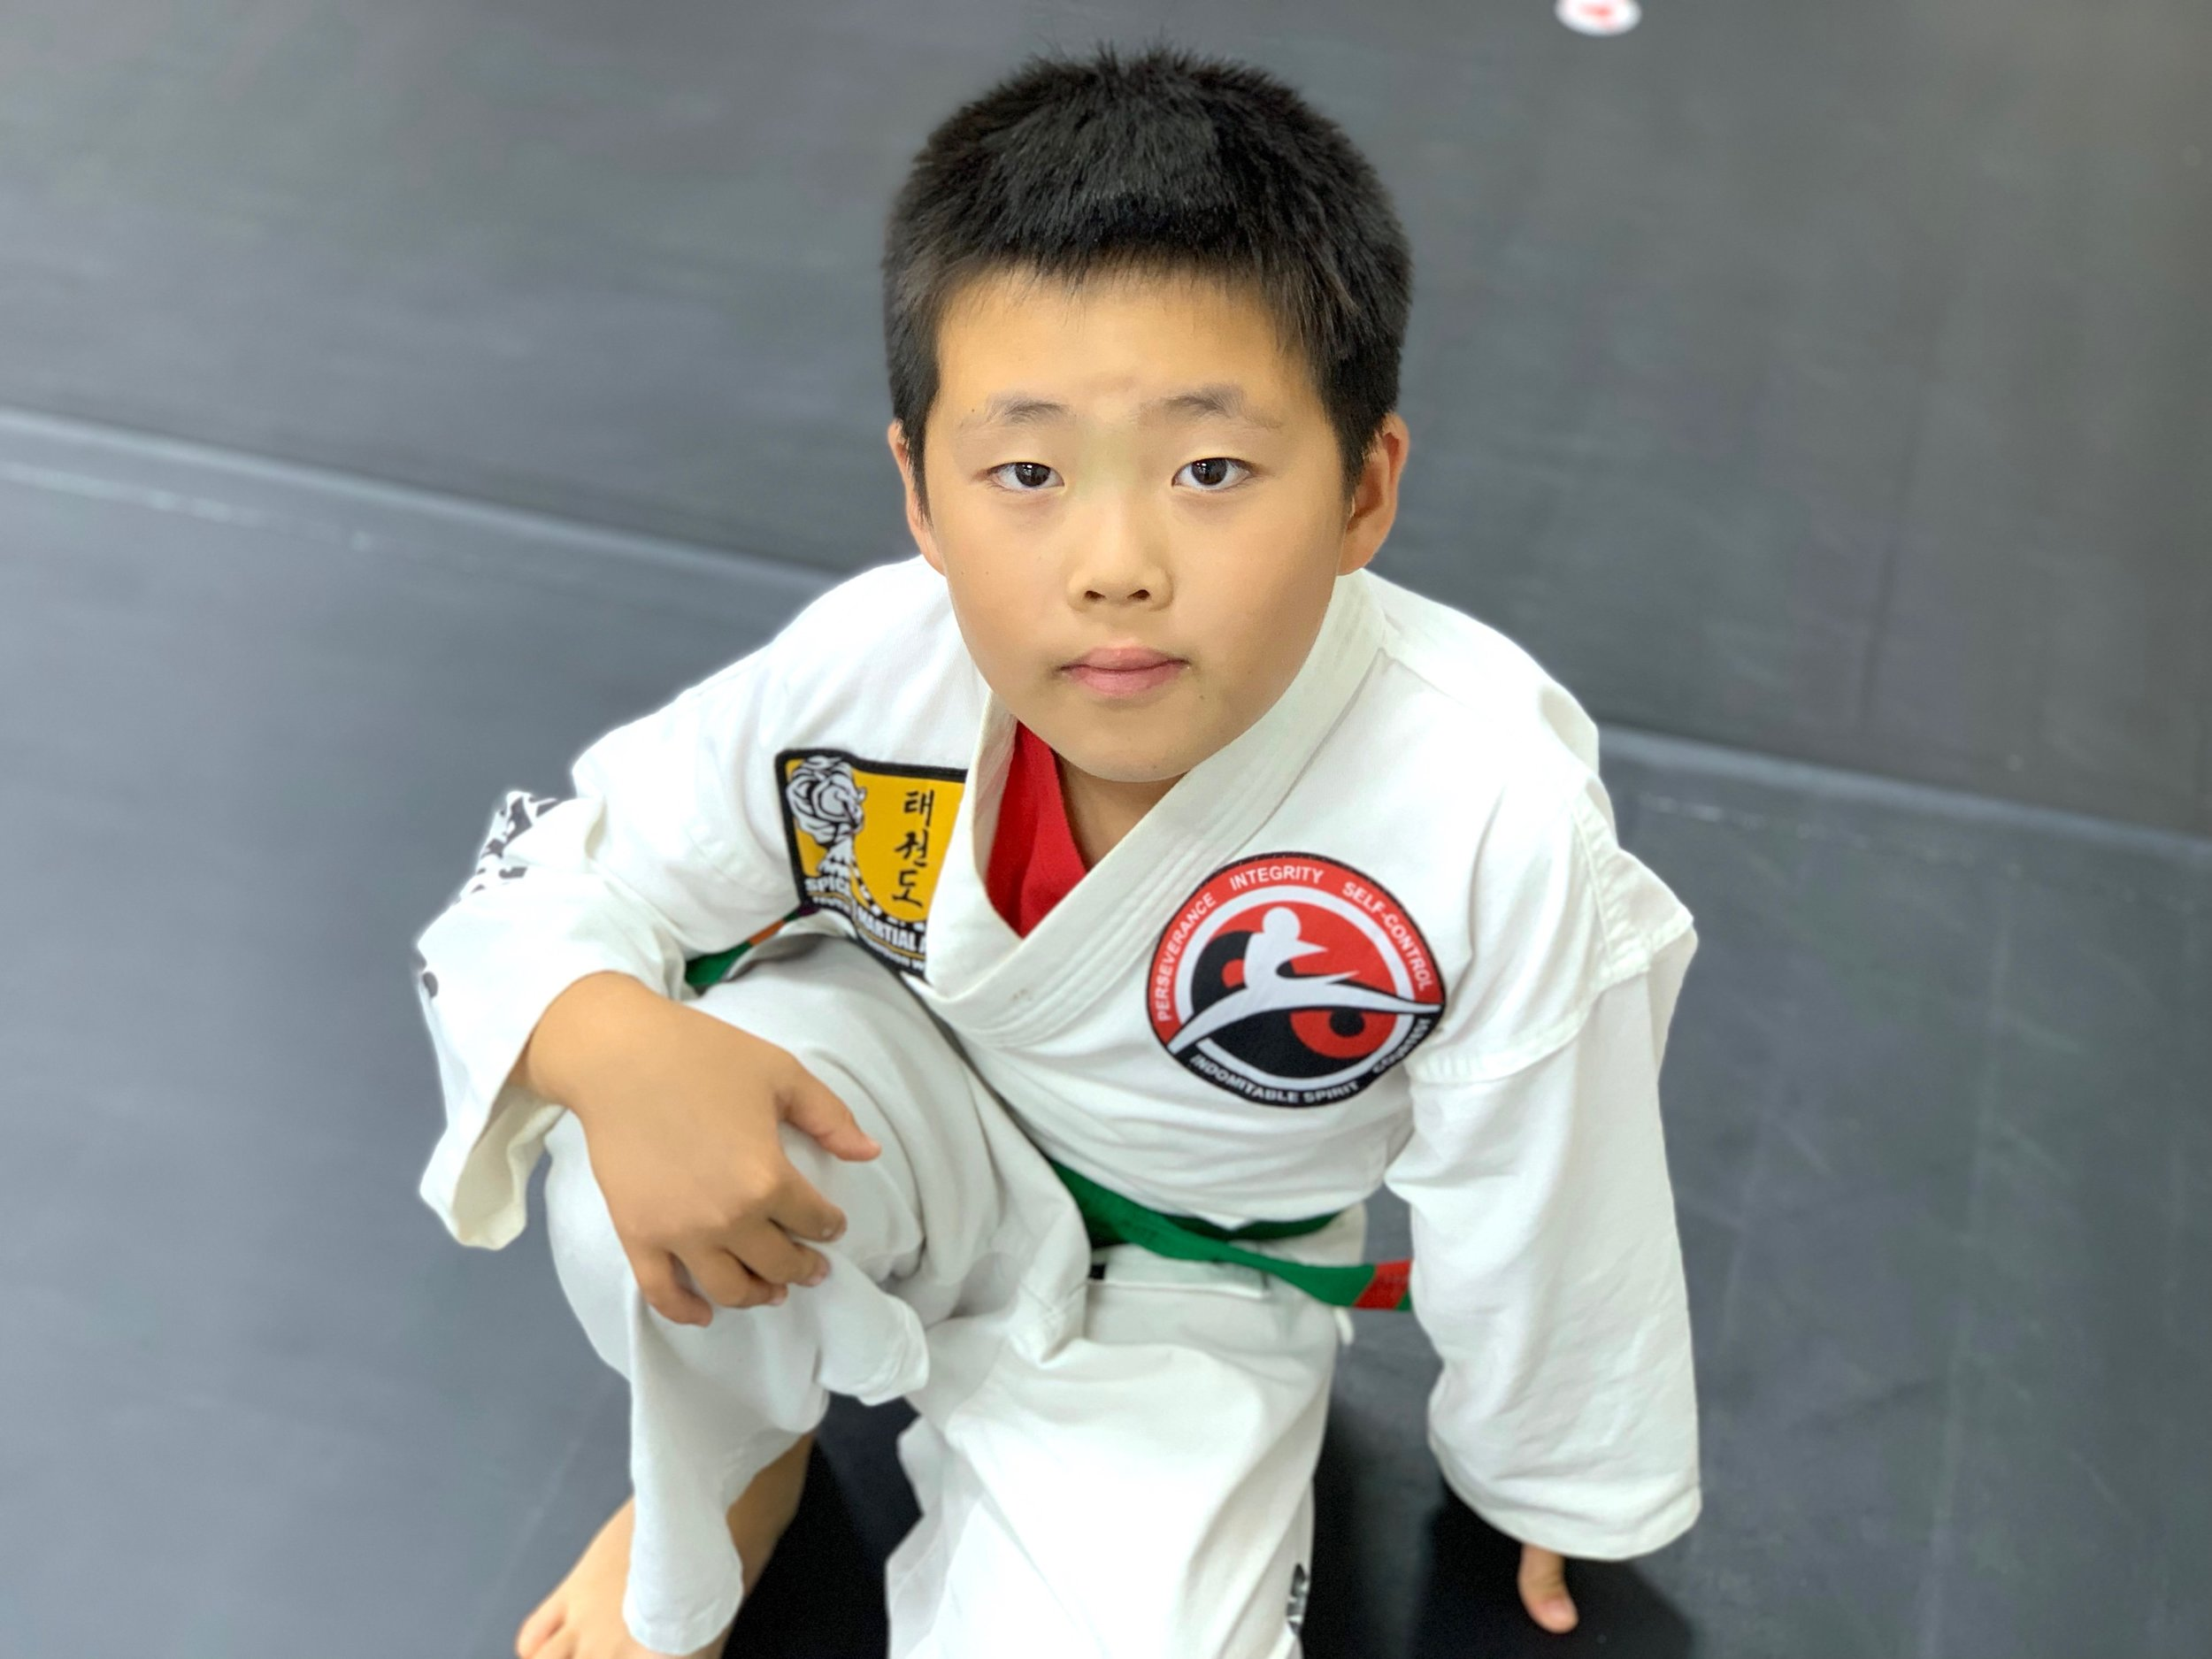 karate-kids-program-souhtlake-keller-grapevine-texas00004.jpeg